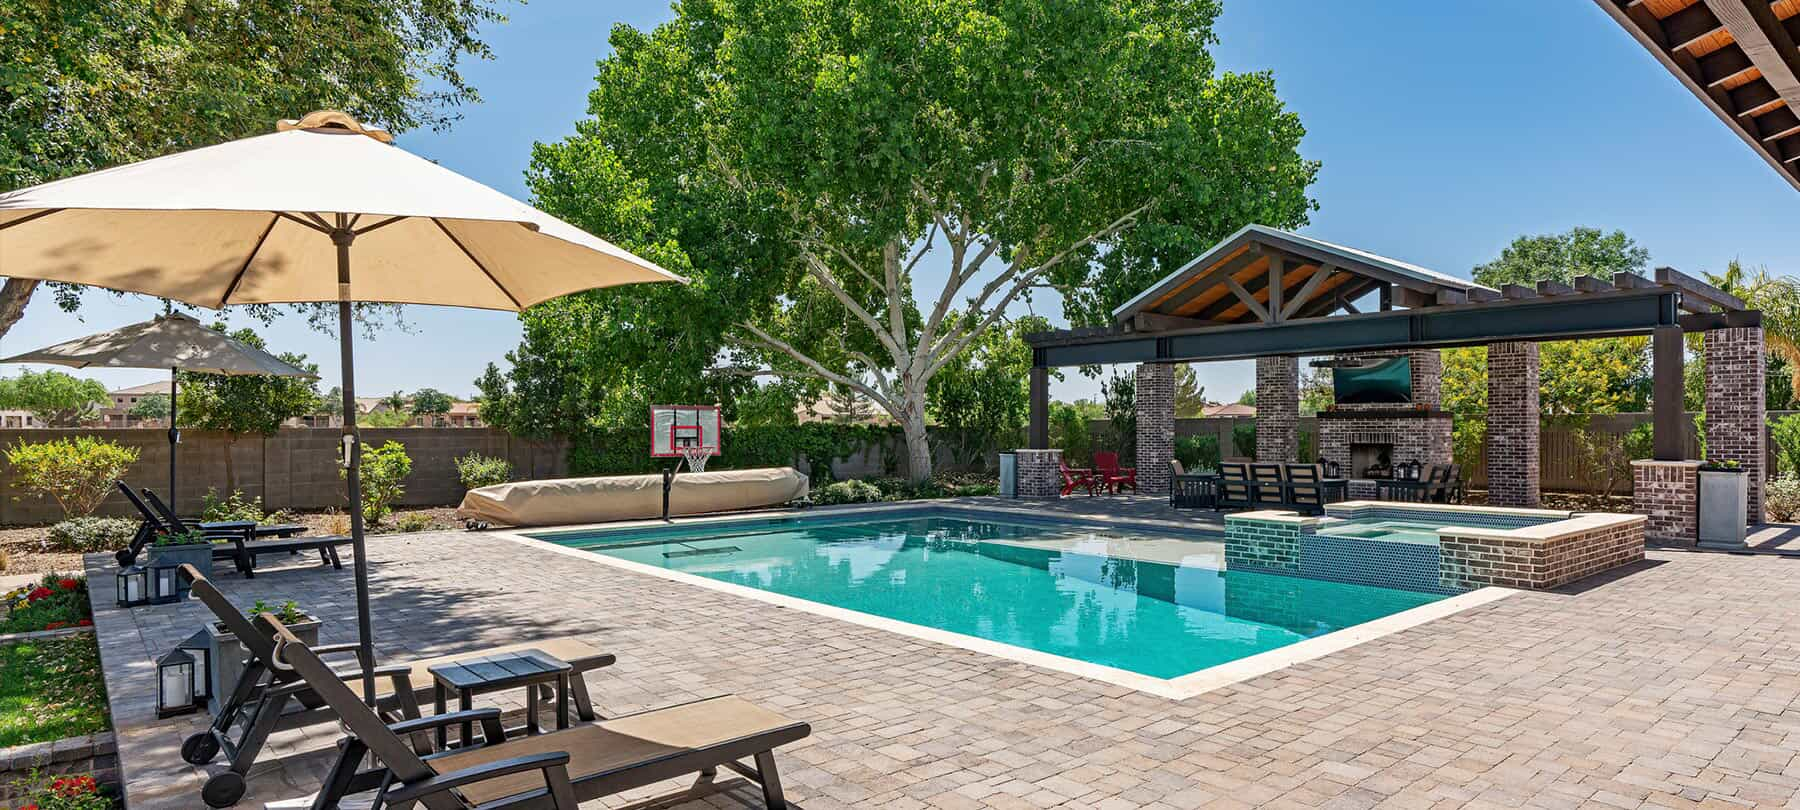 america s swimming pool company of tampa